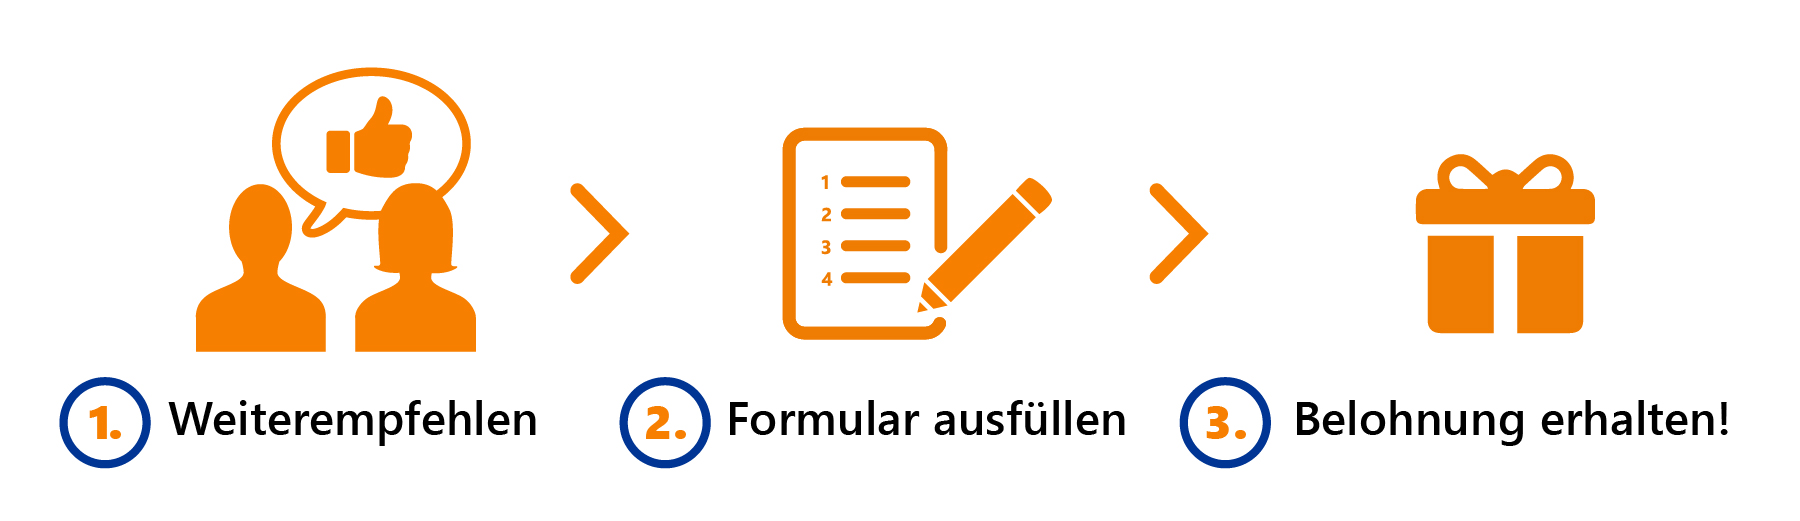 macmon_empfehlungsmarketing_grafik_win-win_b